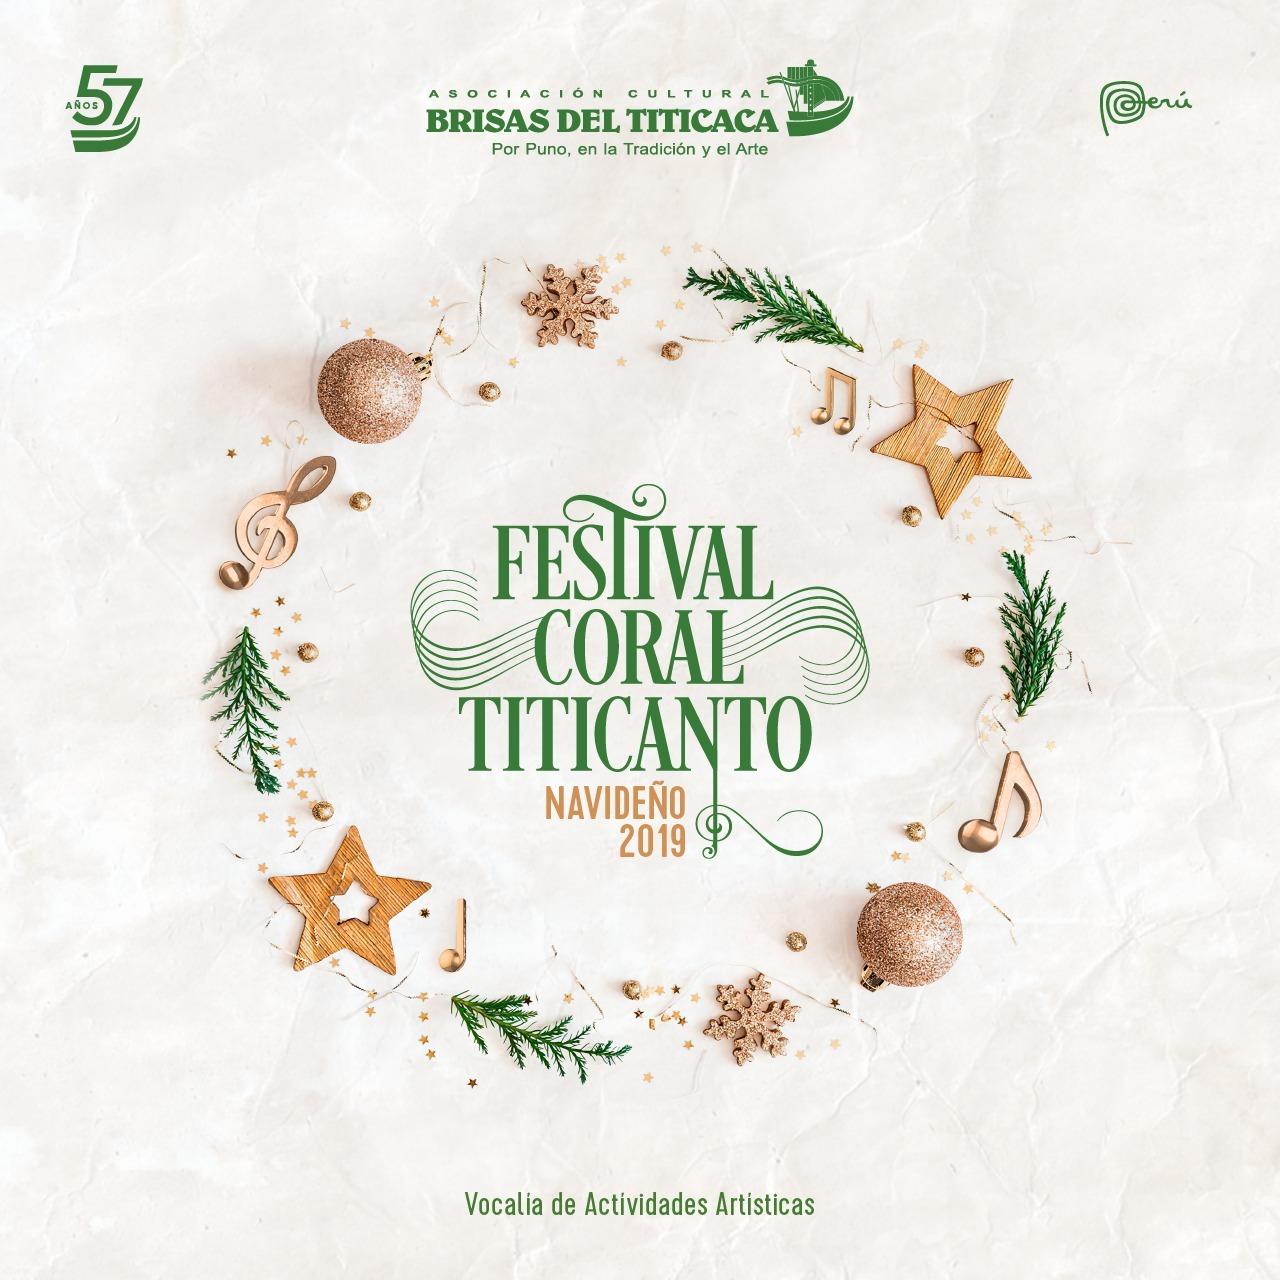 Festival Coral Titicanto Navideño 2019 1